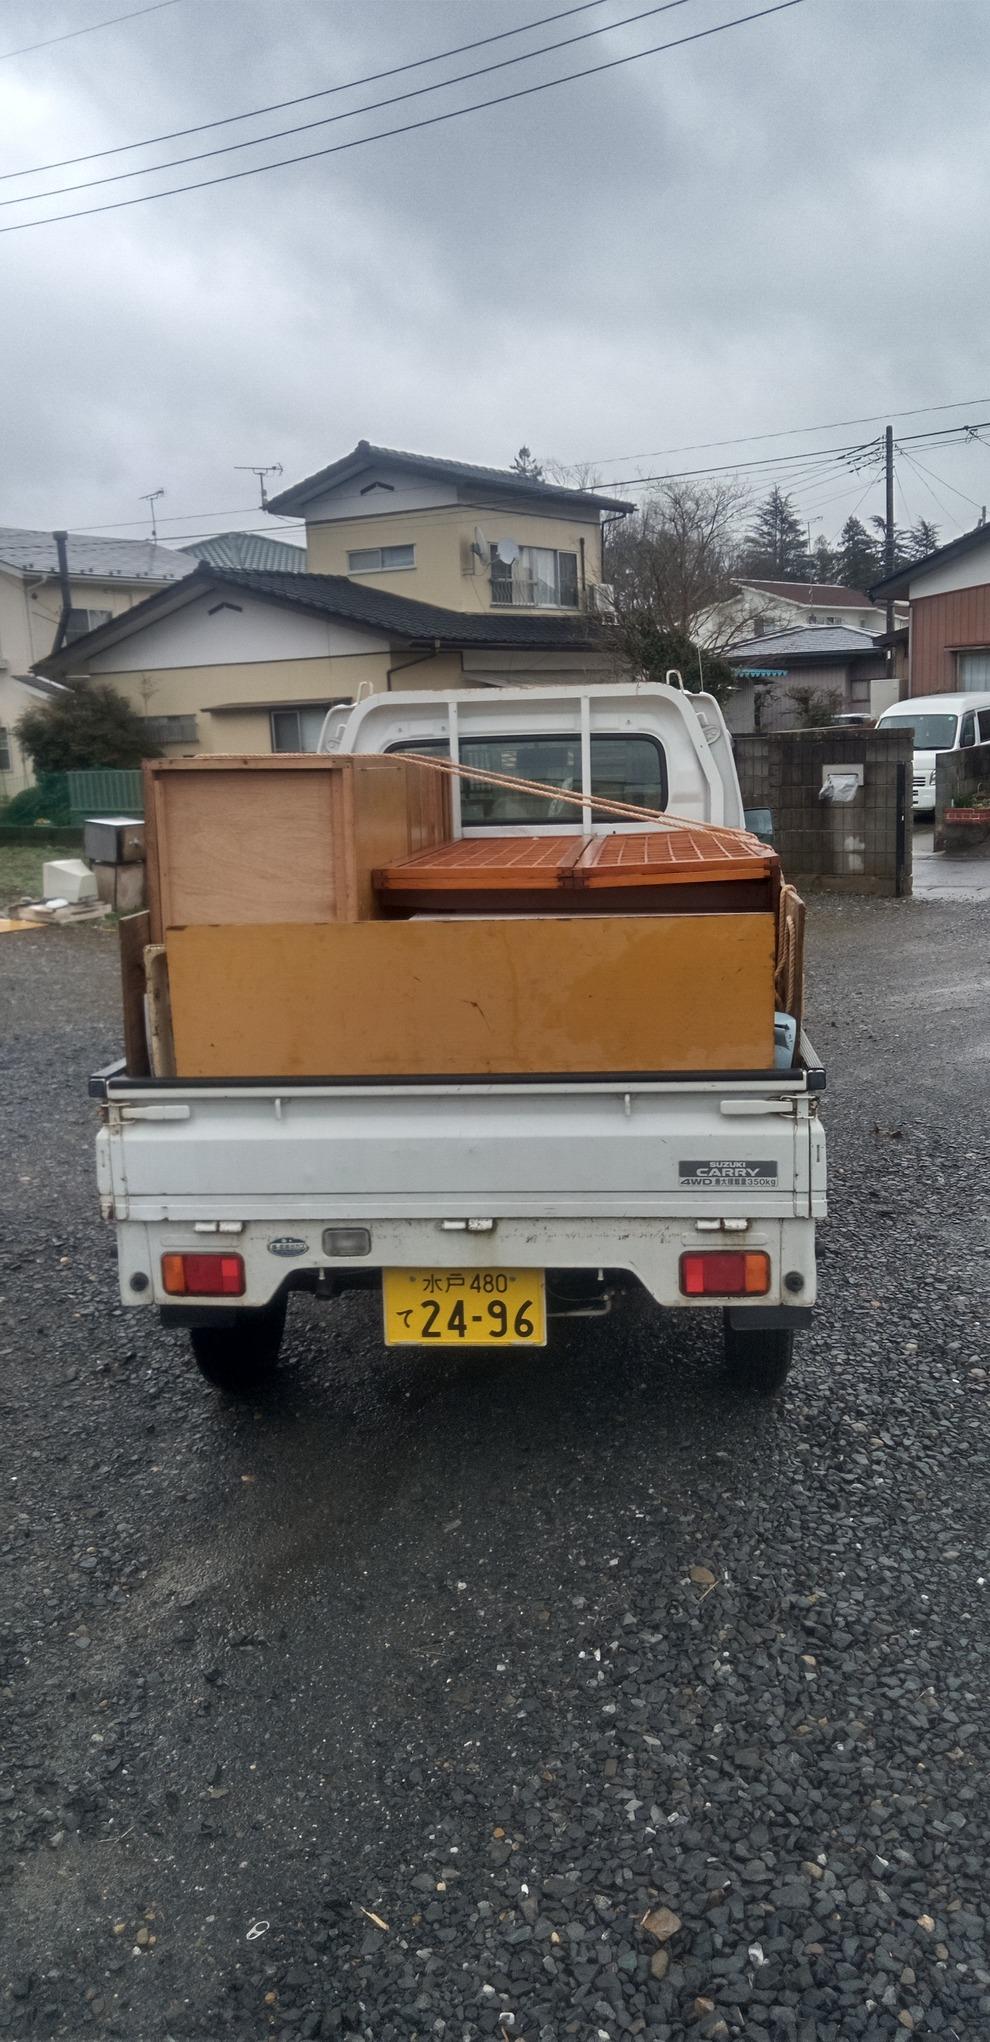 KIMG0036.JPG